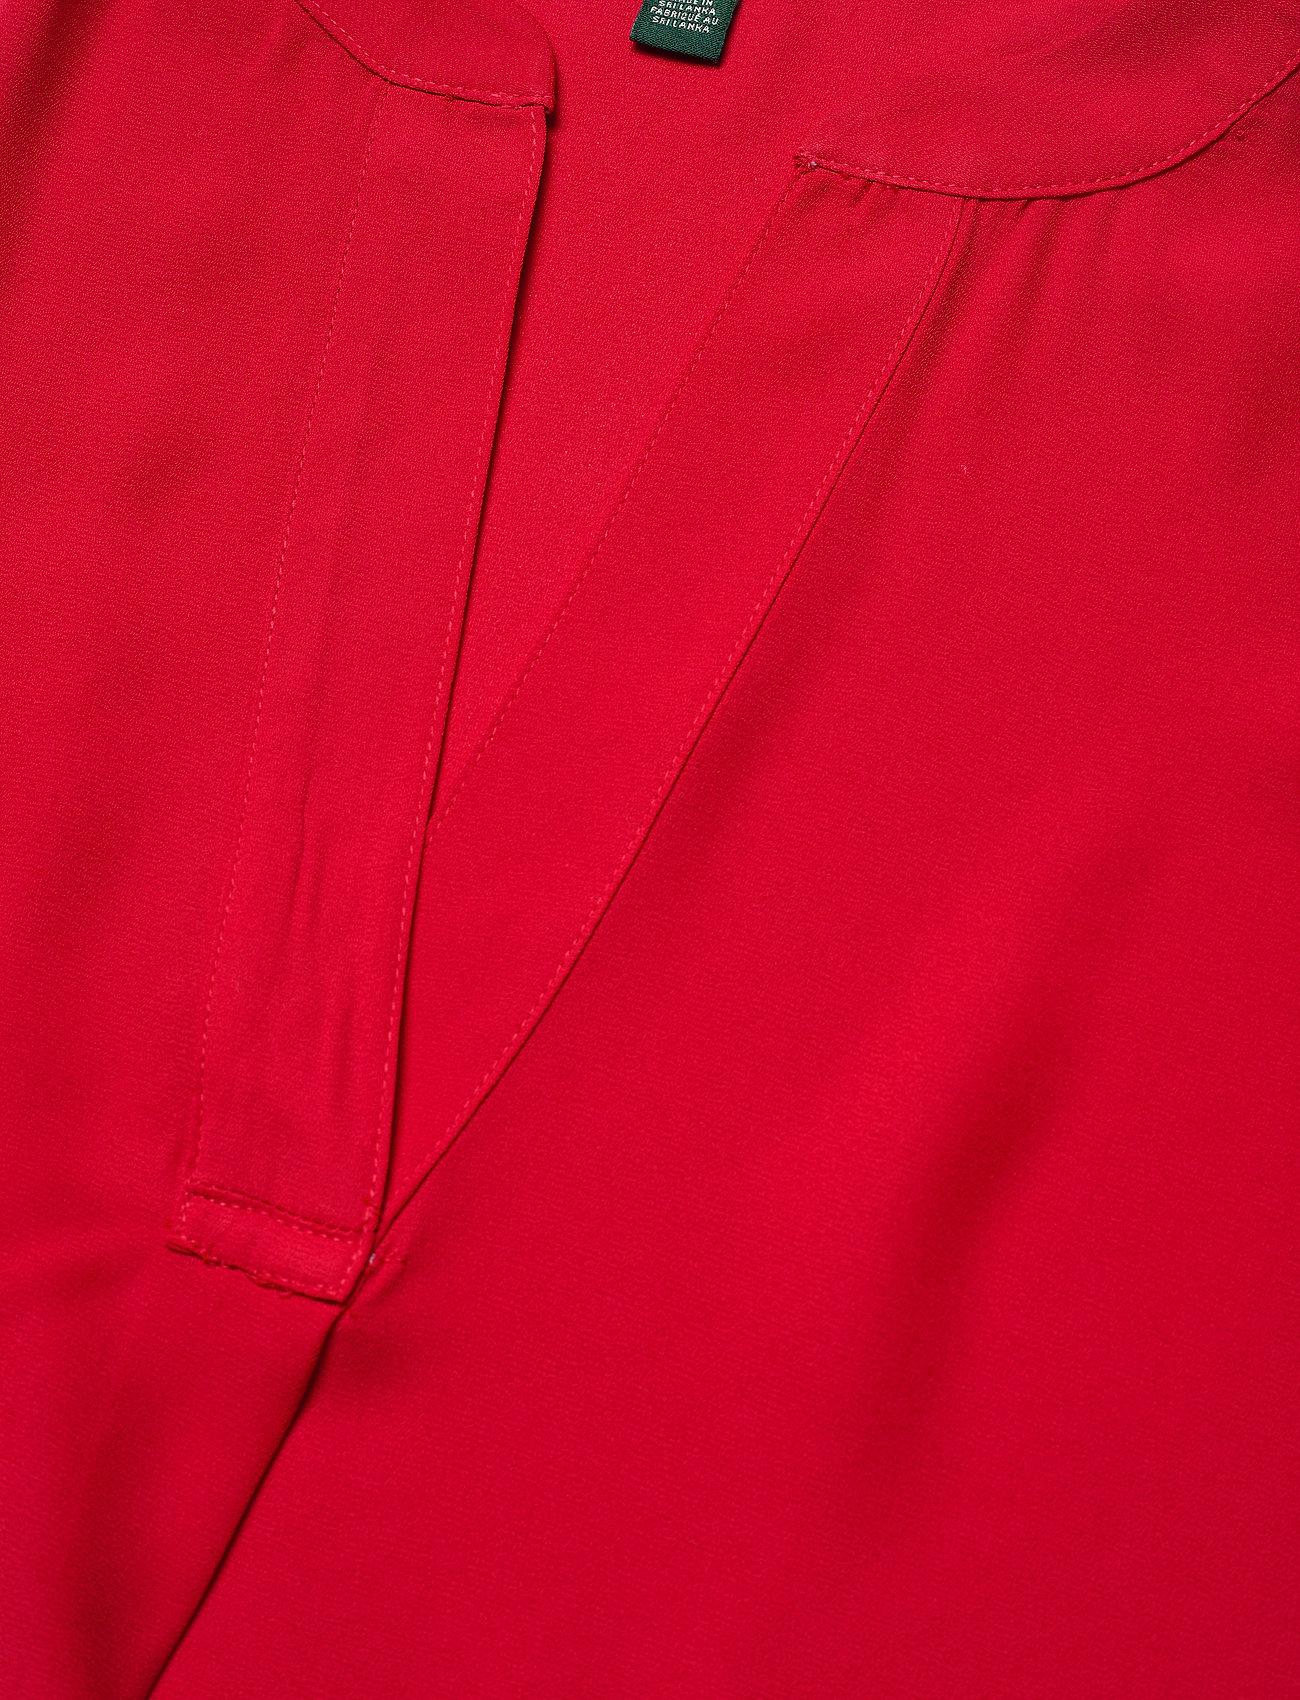 Lauren Ralph Lauren DRAPEY POLY GGT-SHIRT - Bluser & Skjorter ORIENT RED - Dameklær Spesialtilbud